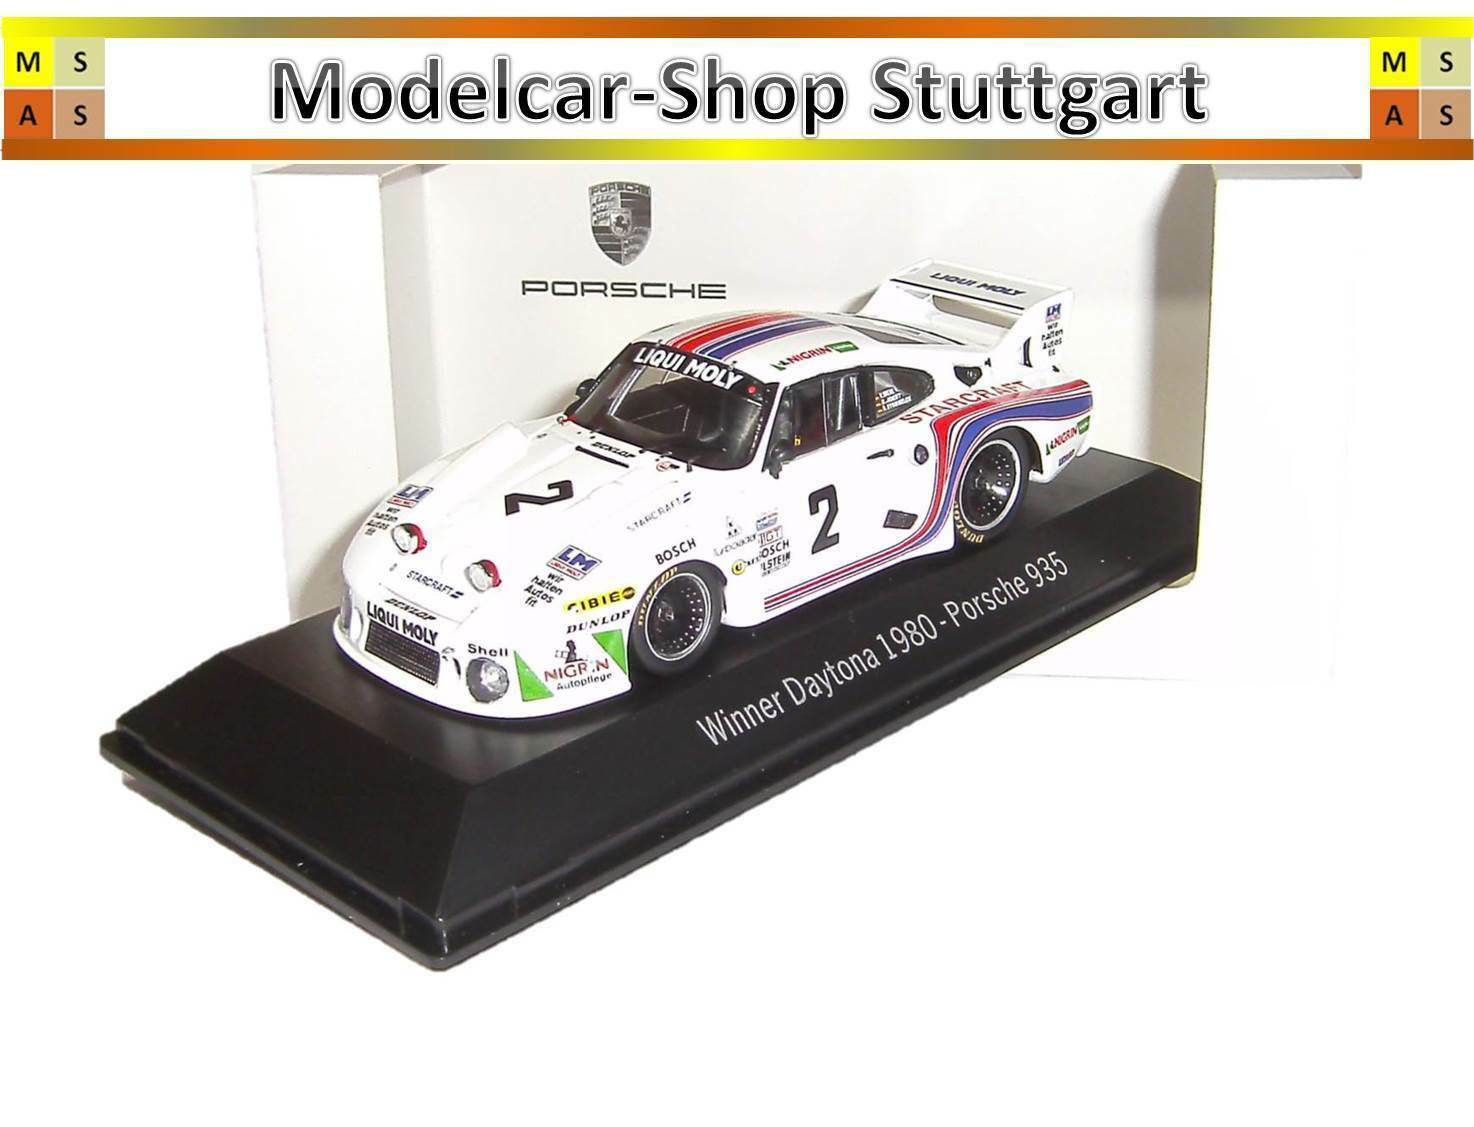 Porsche 935 Winner Daytona 1980 - Spark 1 43 - map02028014 - BRAND NEW